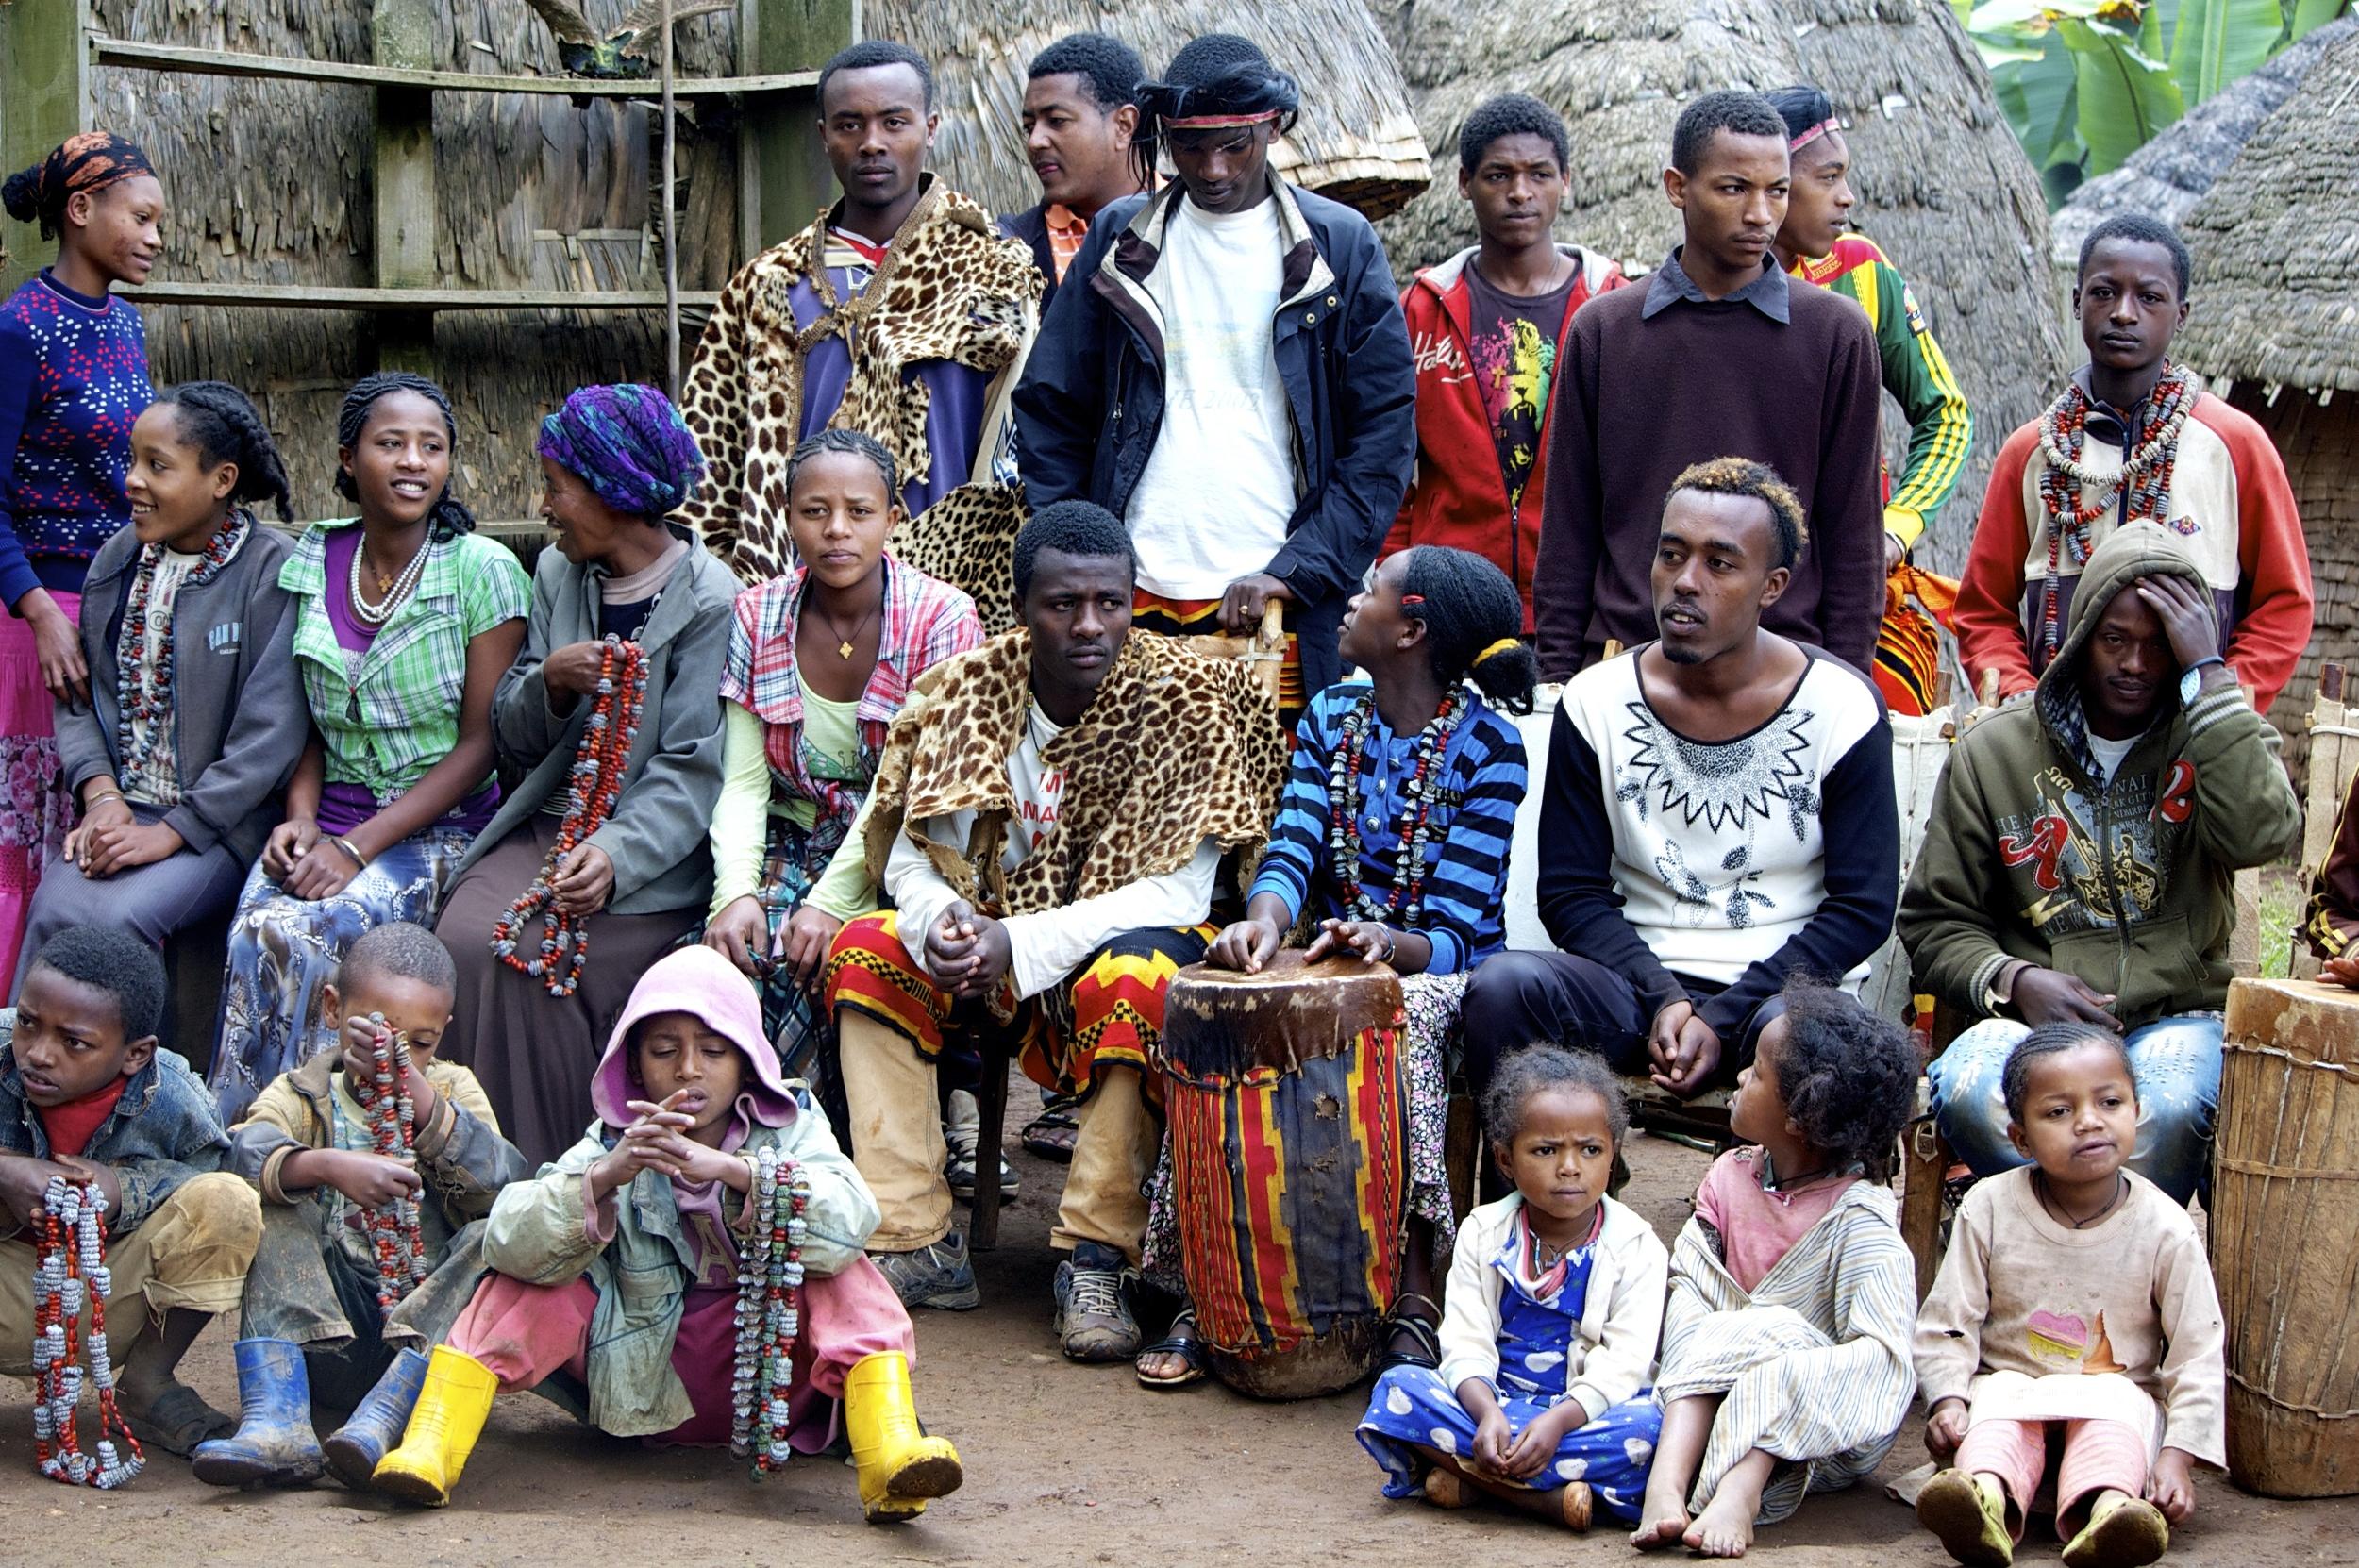 The Dorze tribe